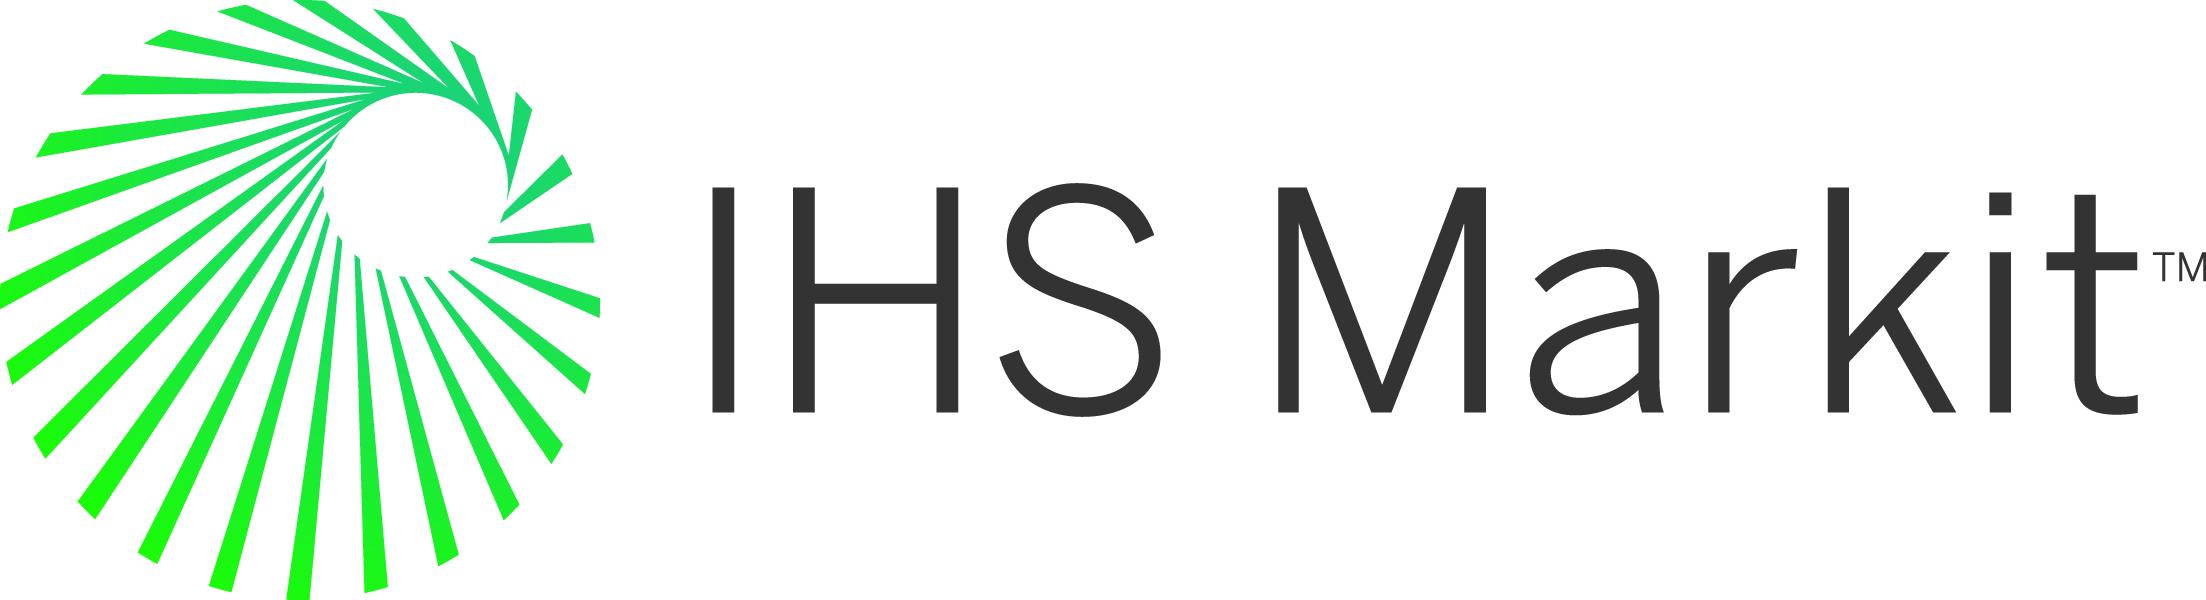 IHS-Markit logo